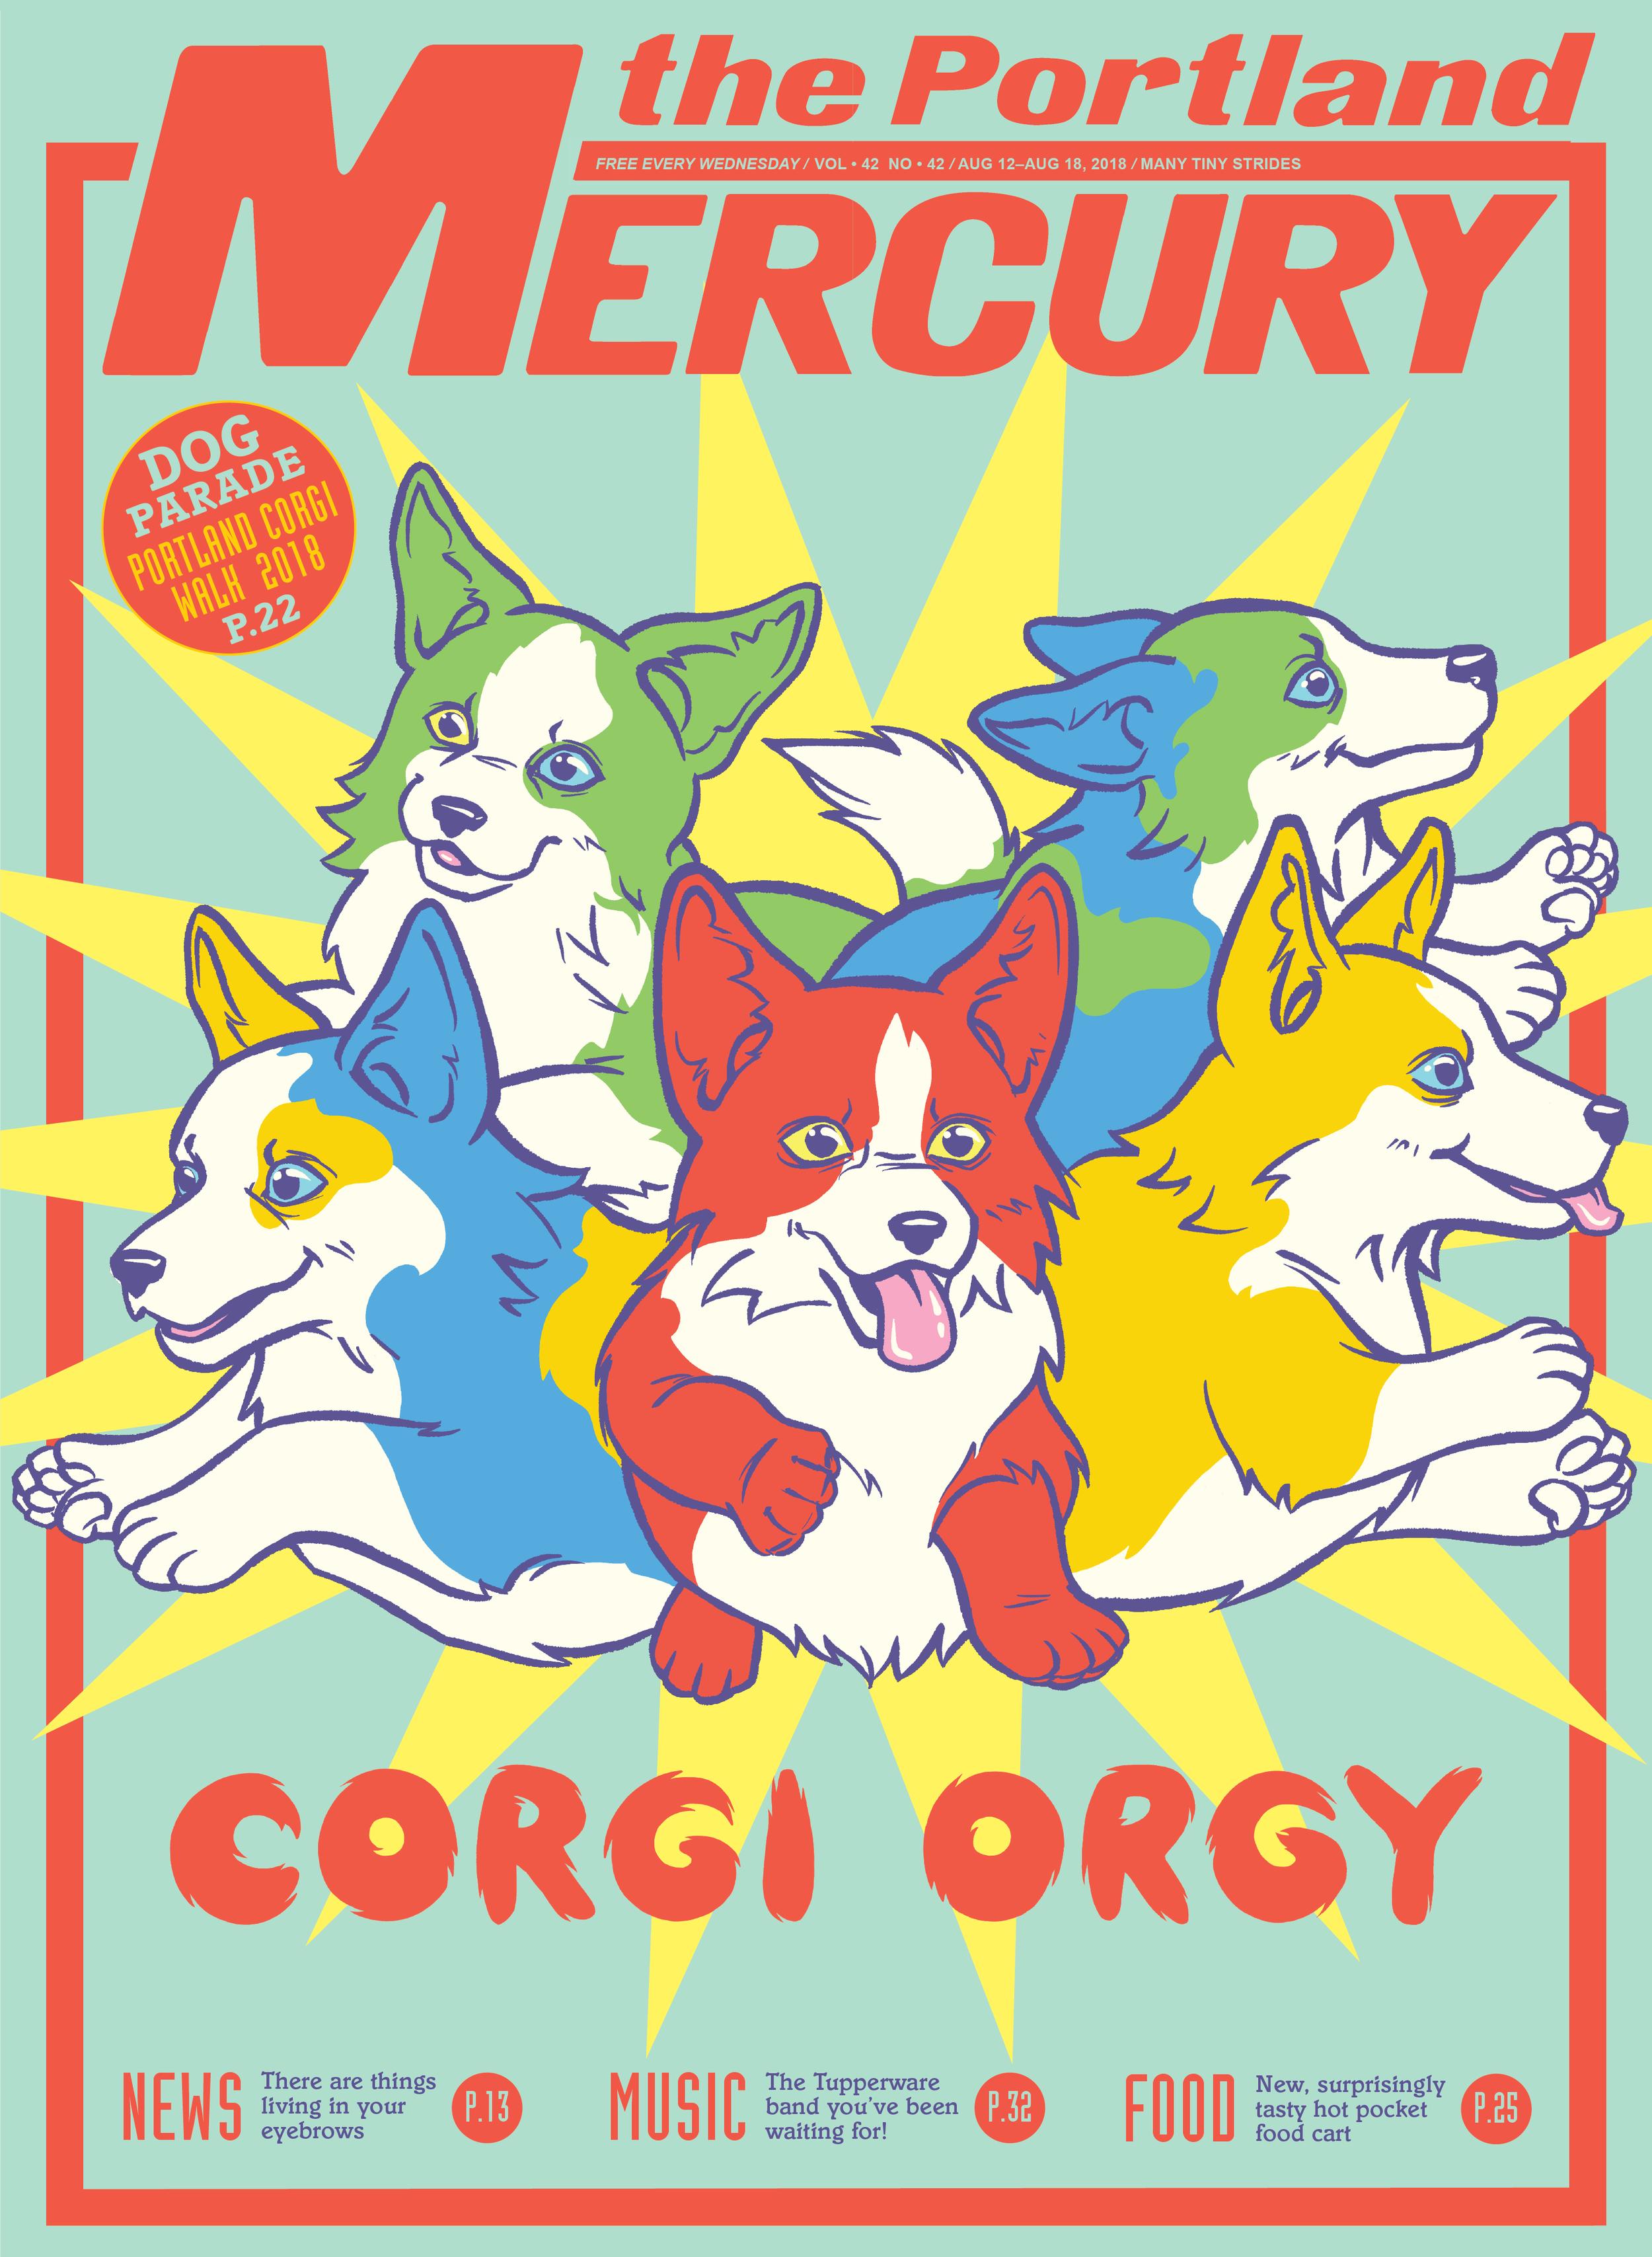 corgiorgy_redo_web.png